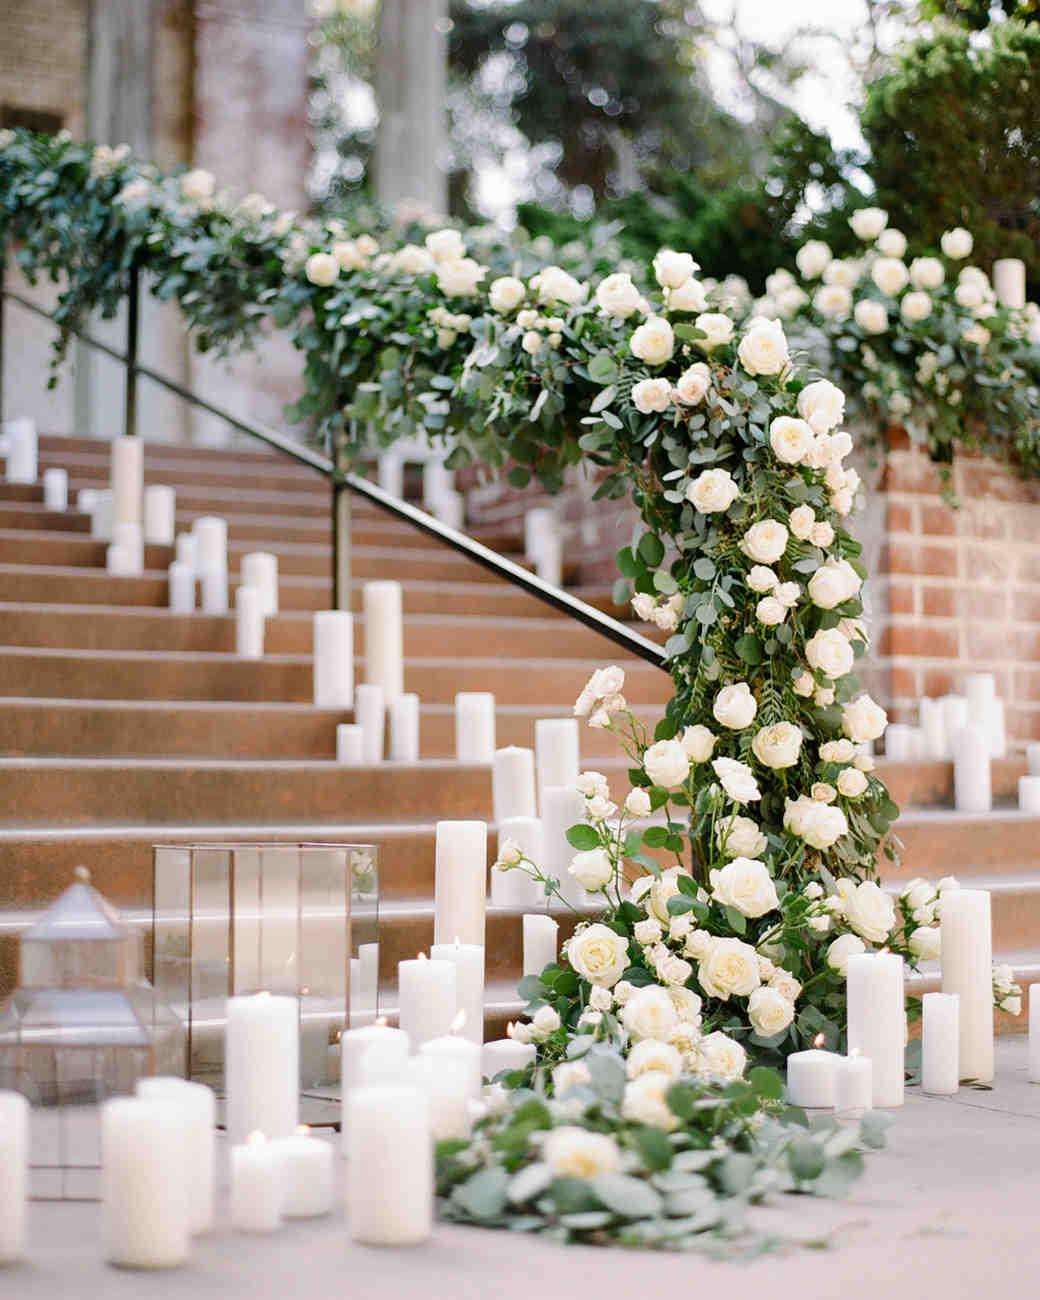 stair banister decor pillar candles